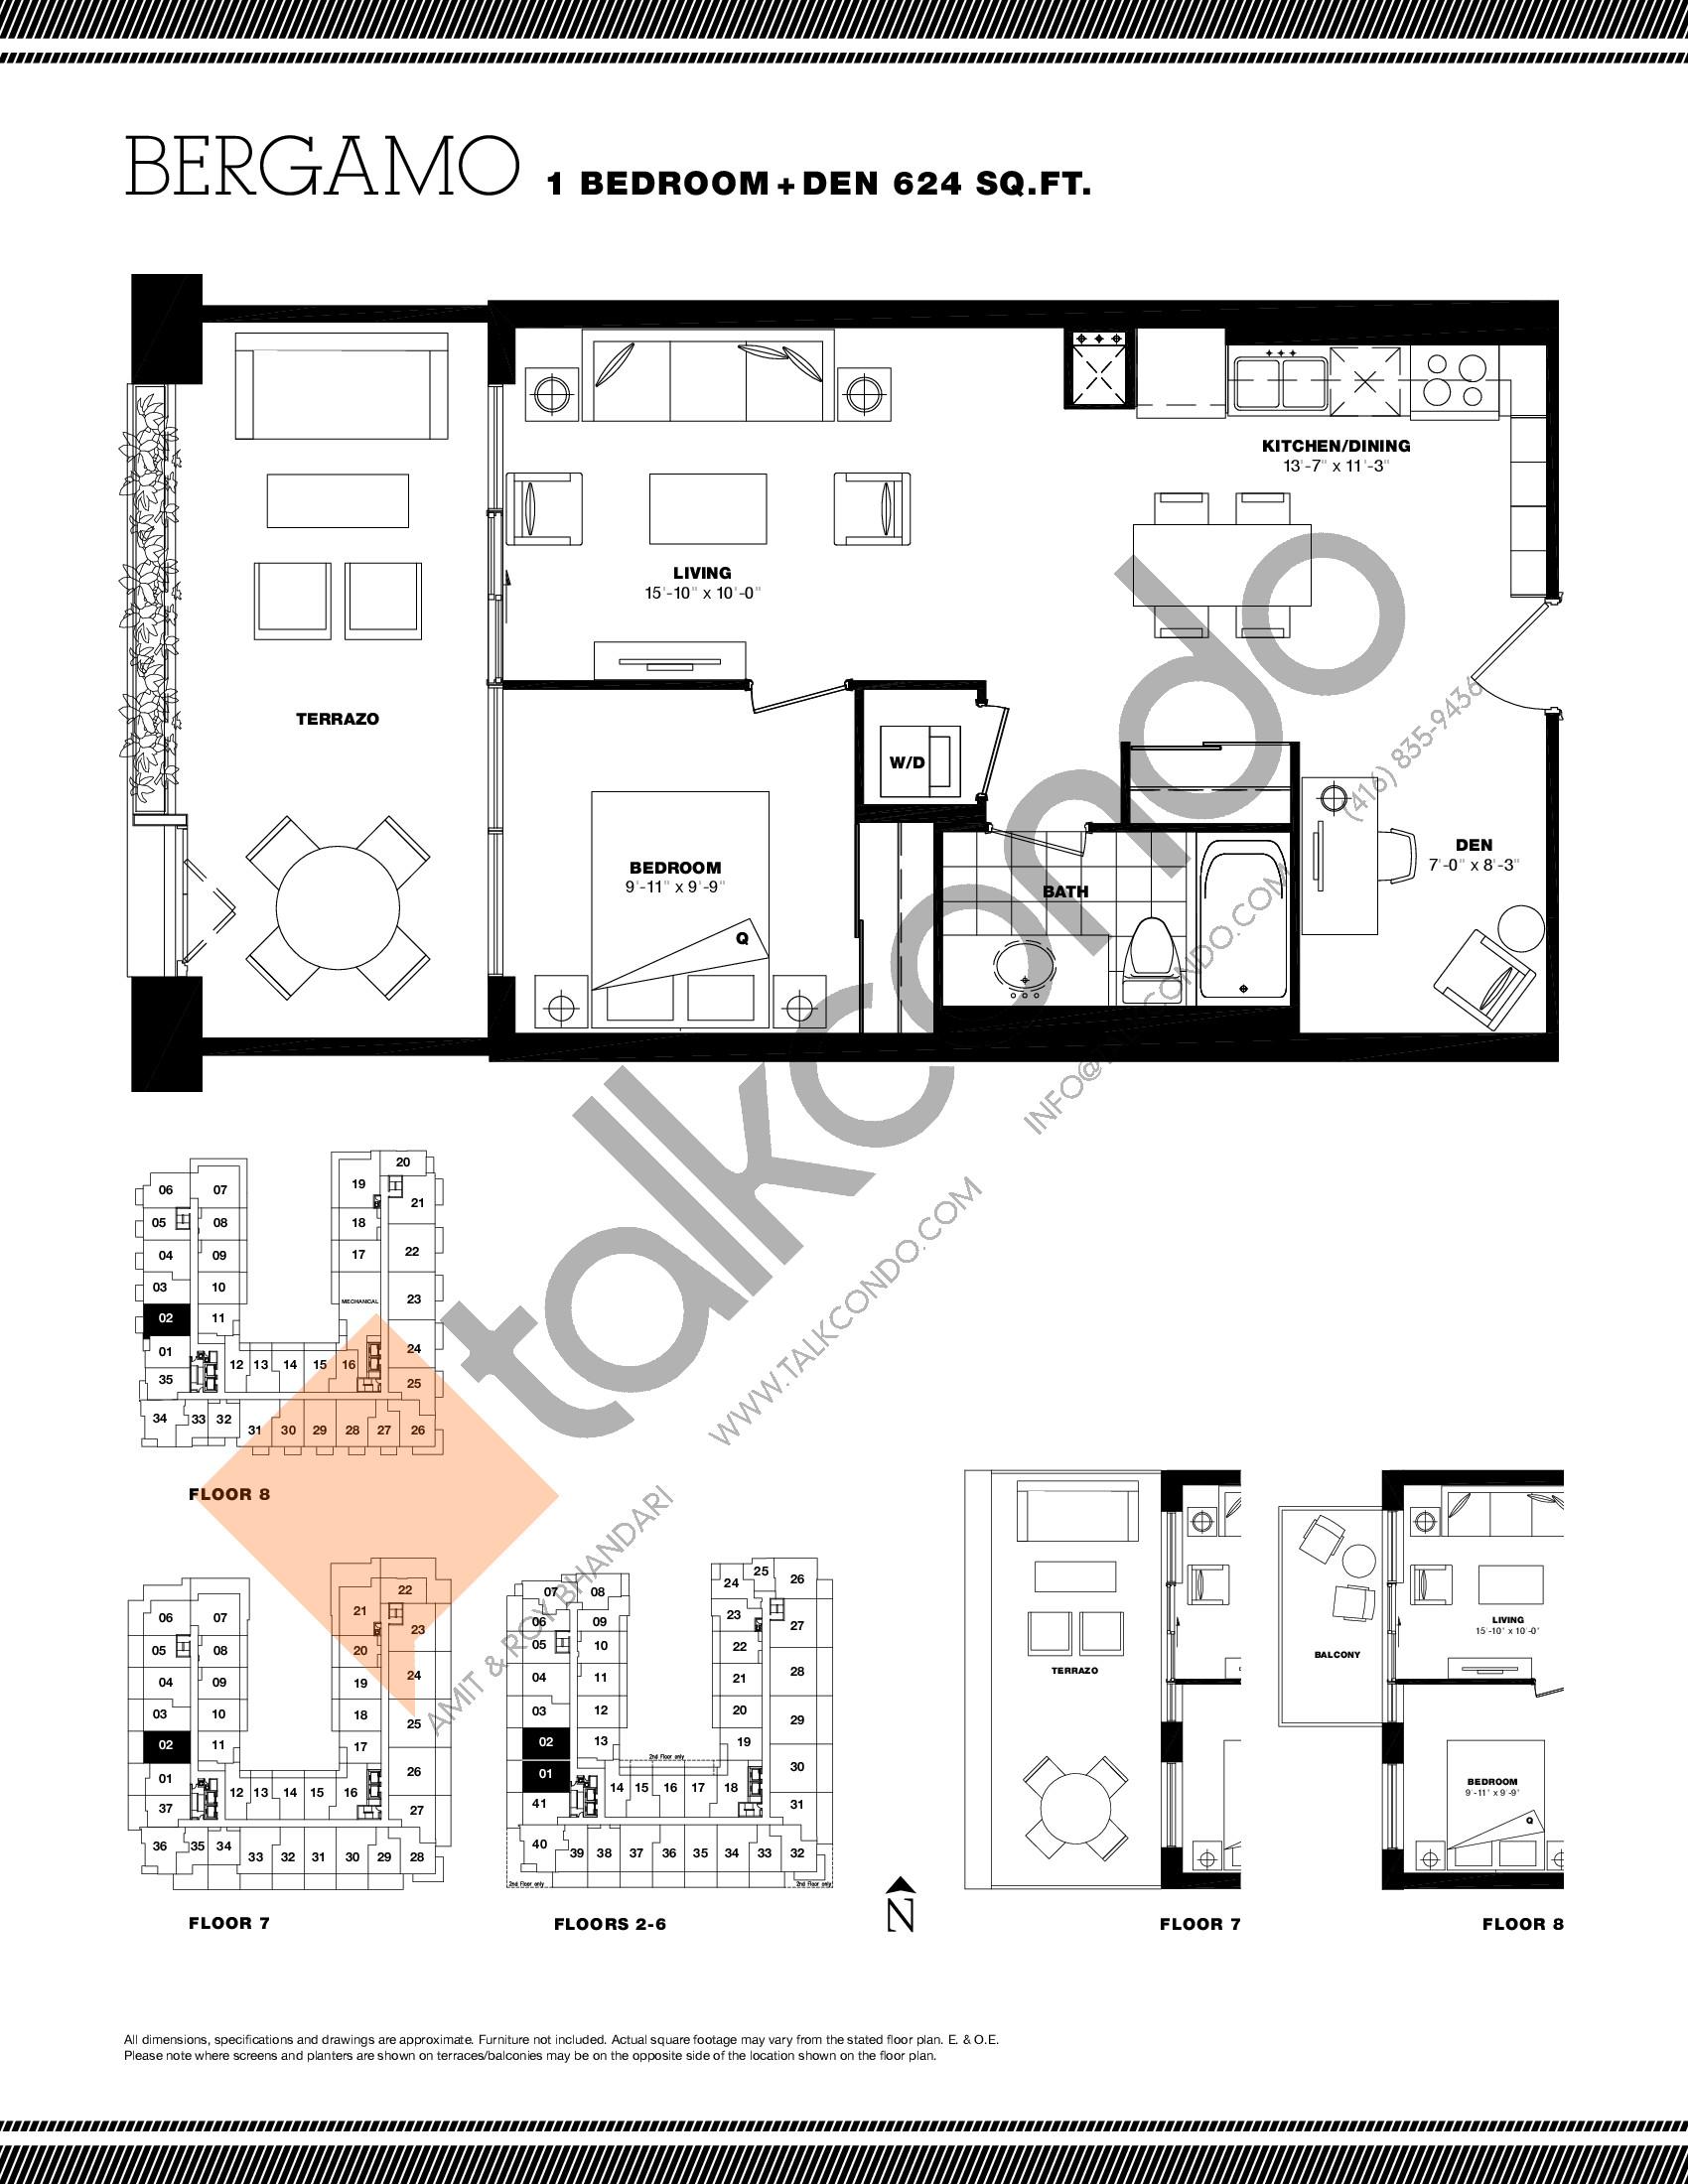 Bergamo Floor Plan at Residenze Palazzo at Treviso 3 Condos - 624 sq.ft